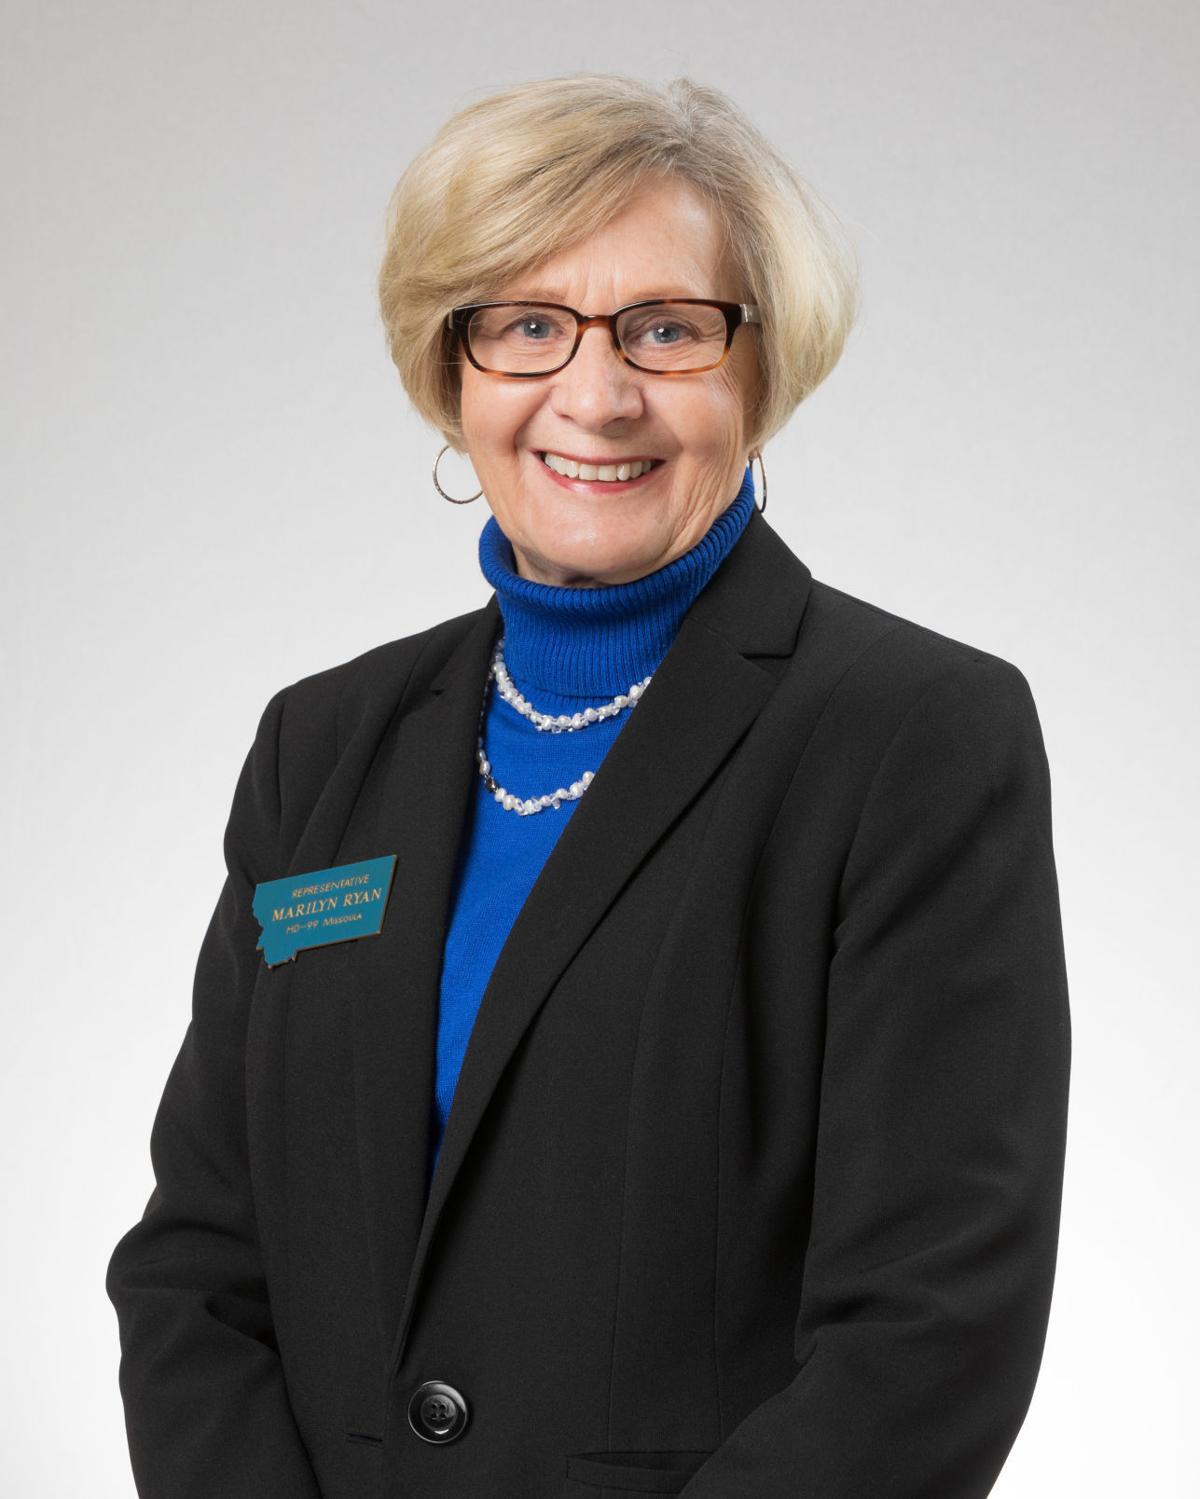 Rep. Marilyn Ryan